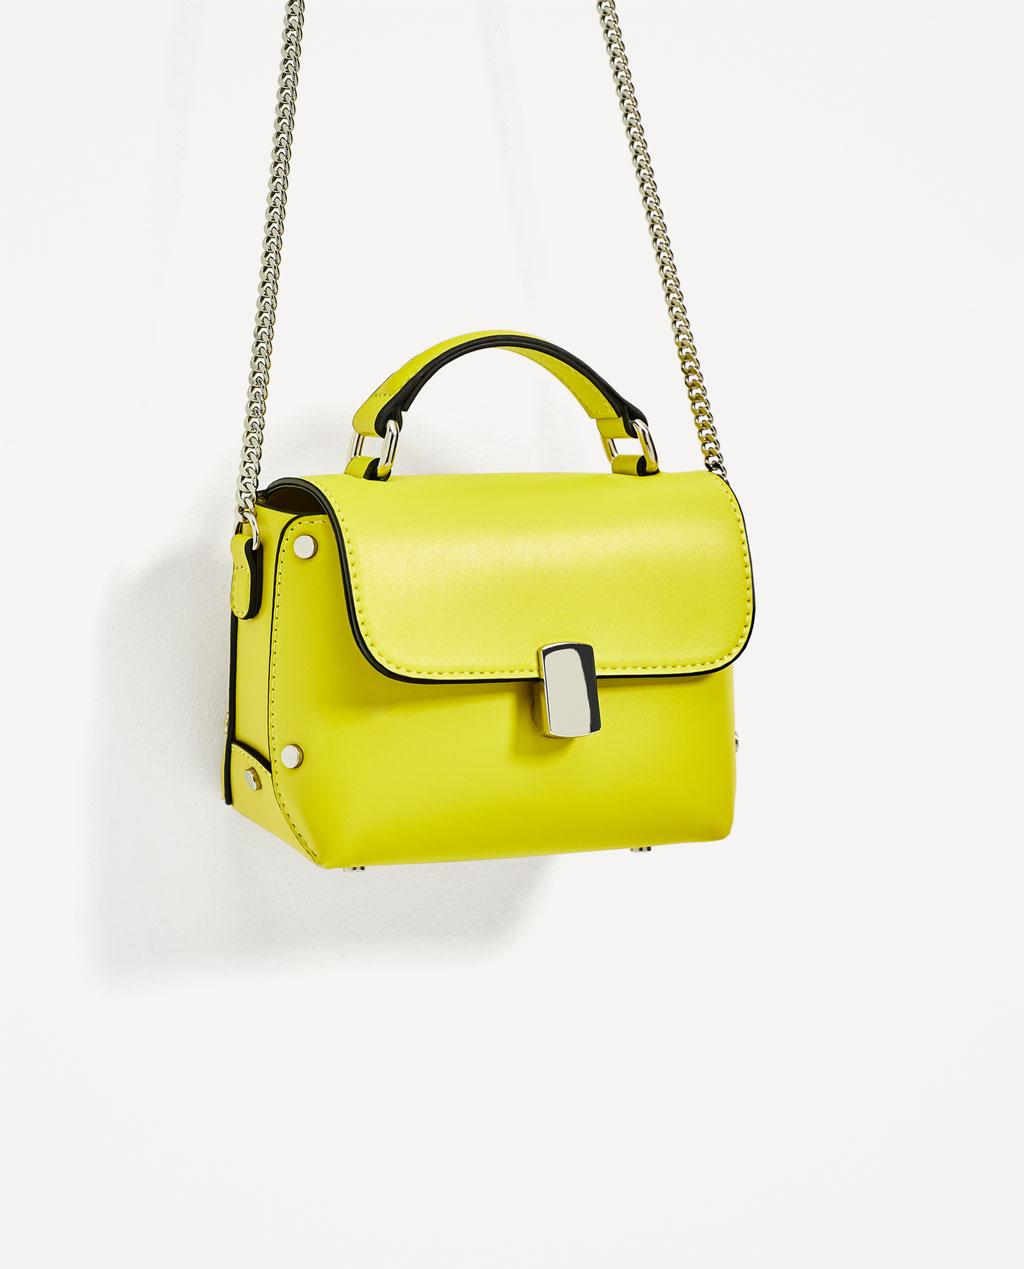 żółta mała torebka